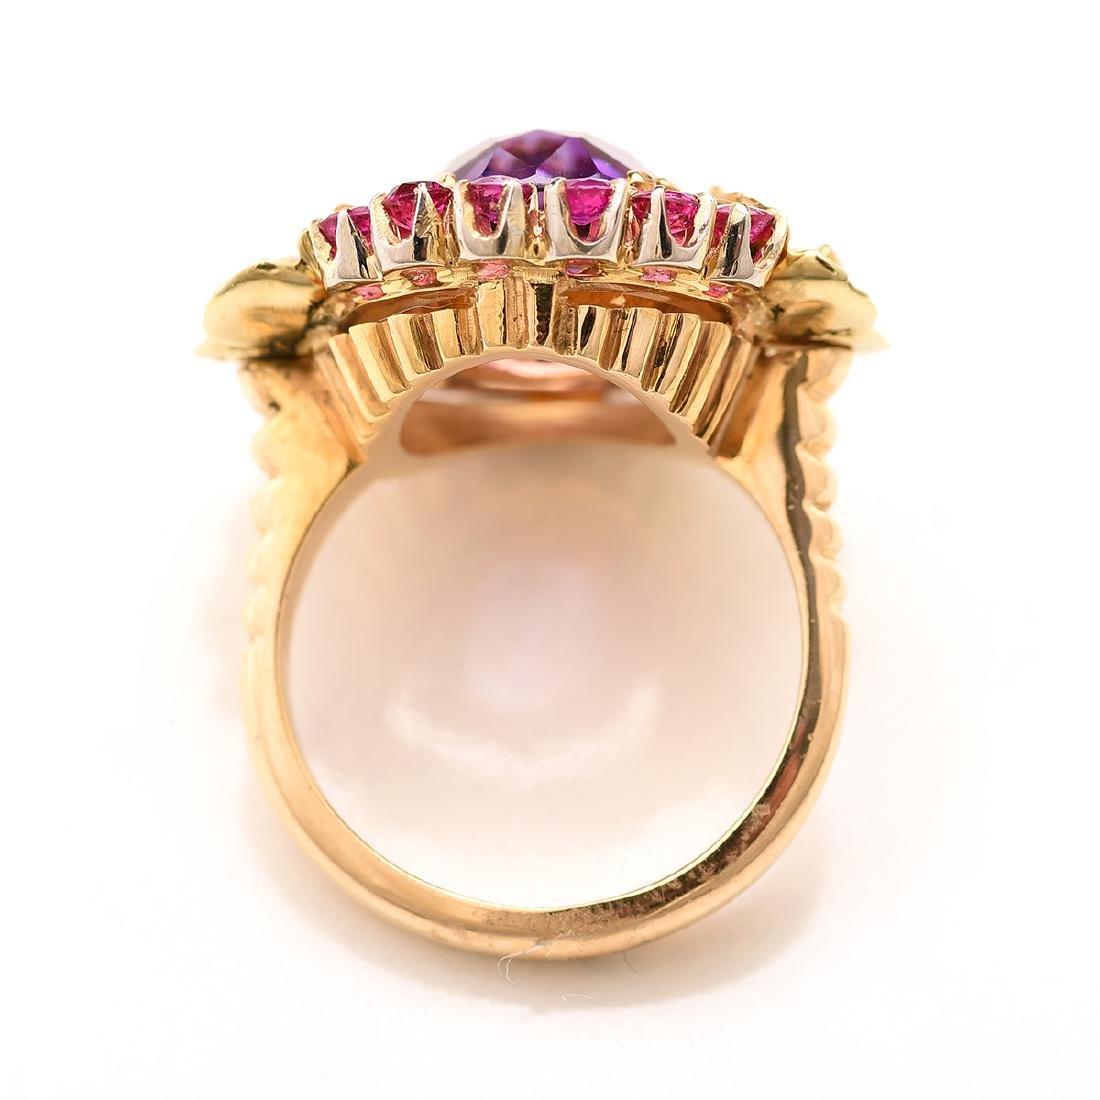 Amethyst, Ruby, Diamond, 14k Ring. - 3